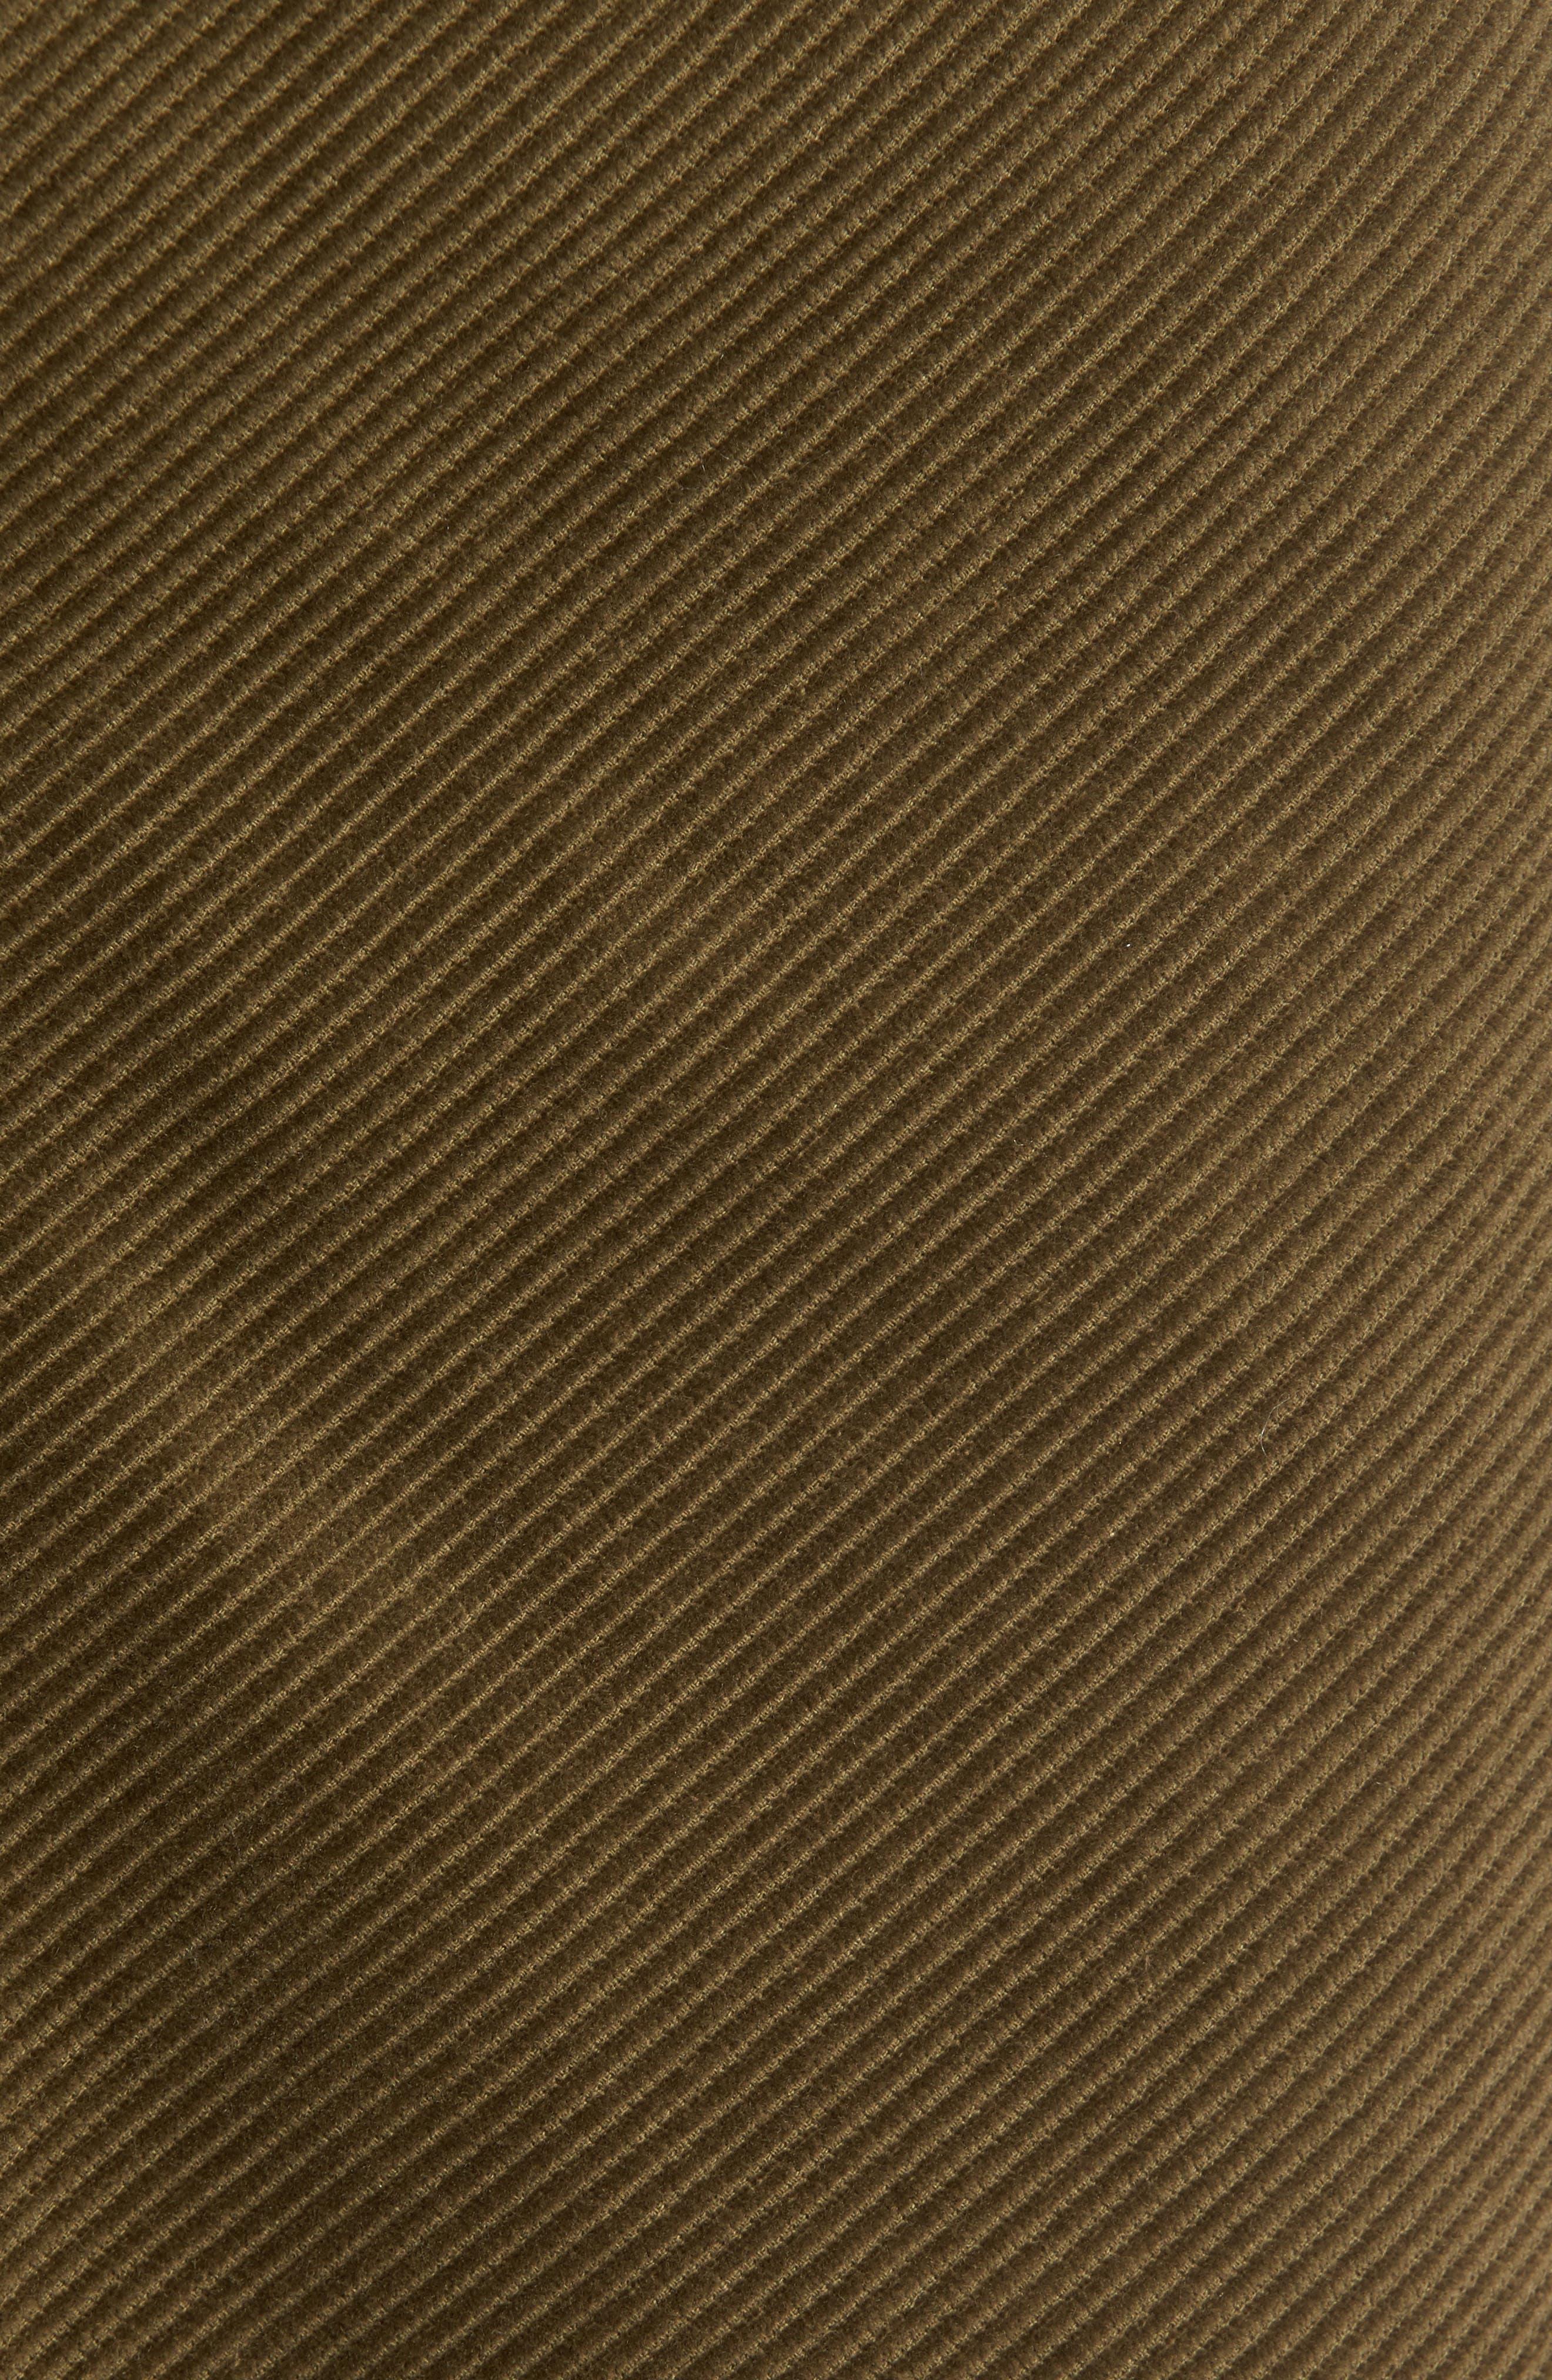 Corduroy A-Line Miniskirt,                             Alternate thumbnail 5, color,                             311